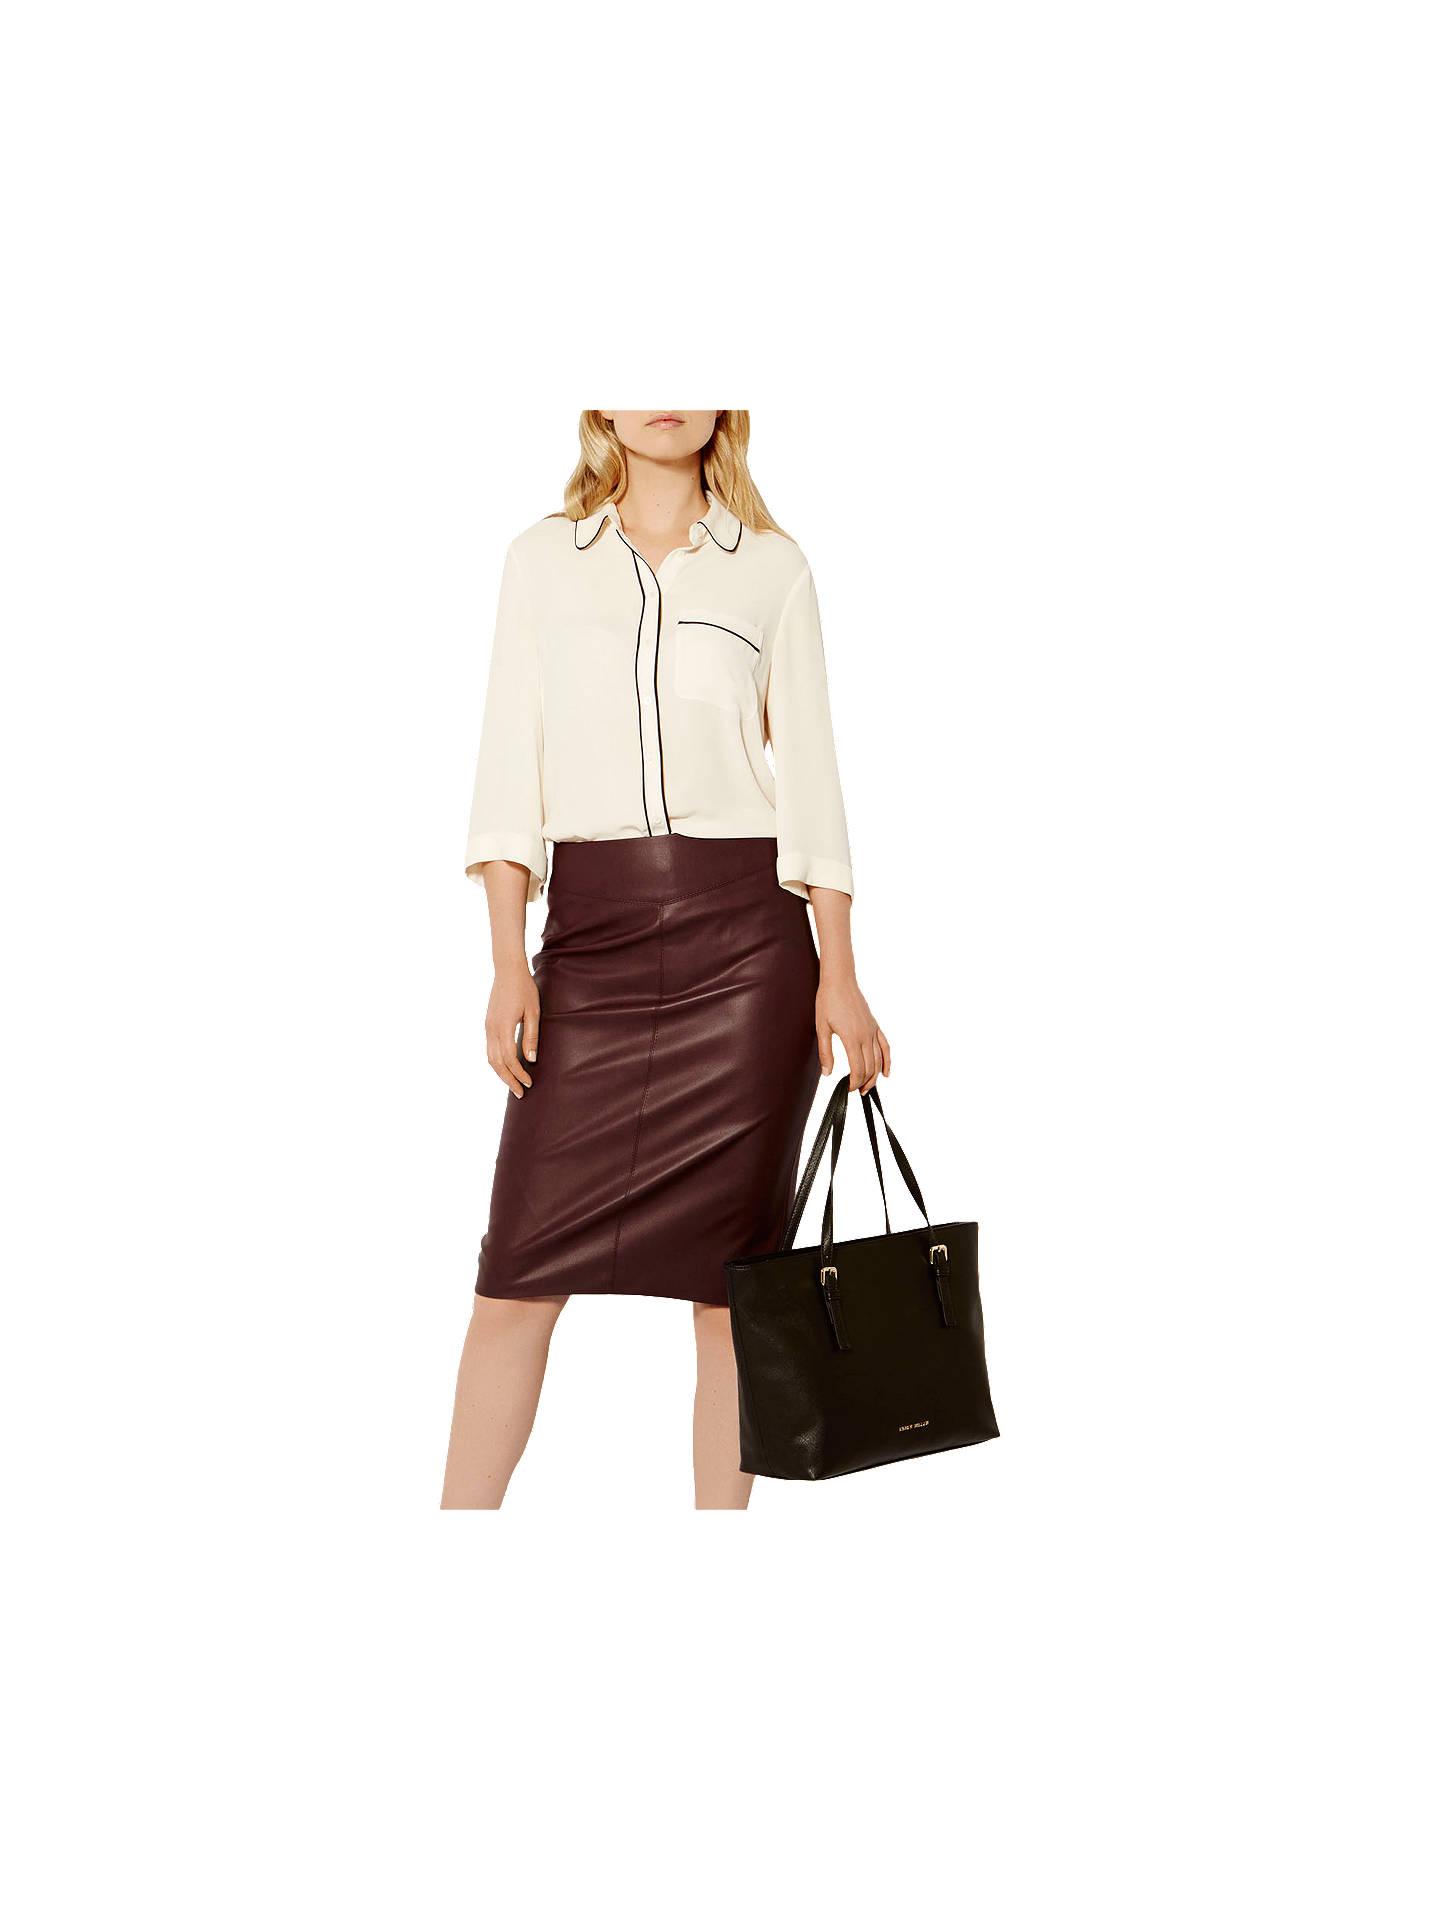 2183f277acf Karen Millen Faux Leather Pencil Skirt Aubergine   Saddha